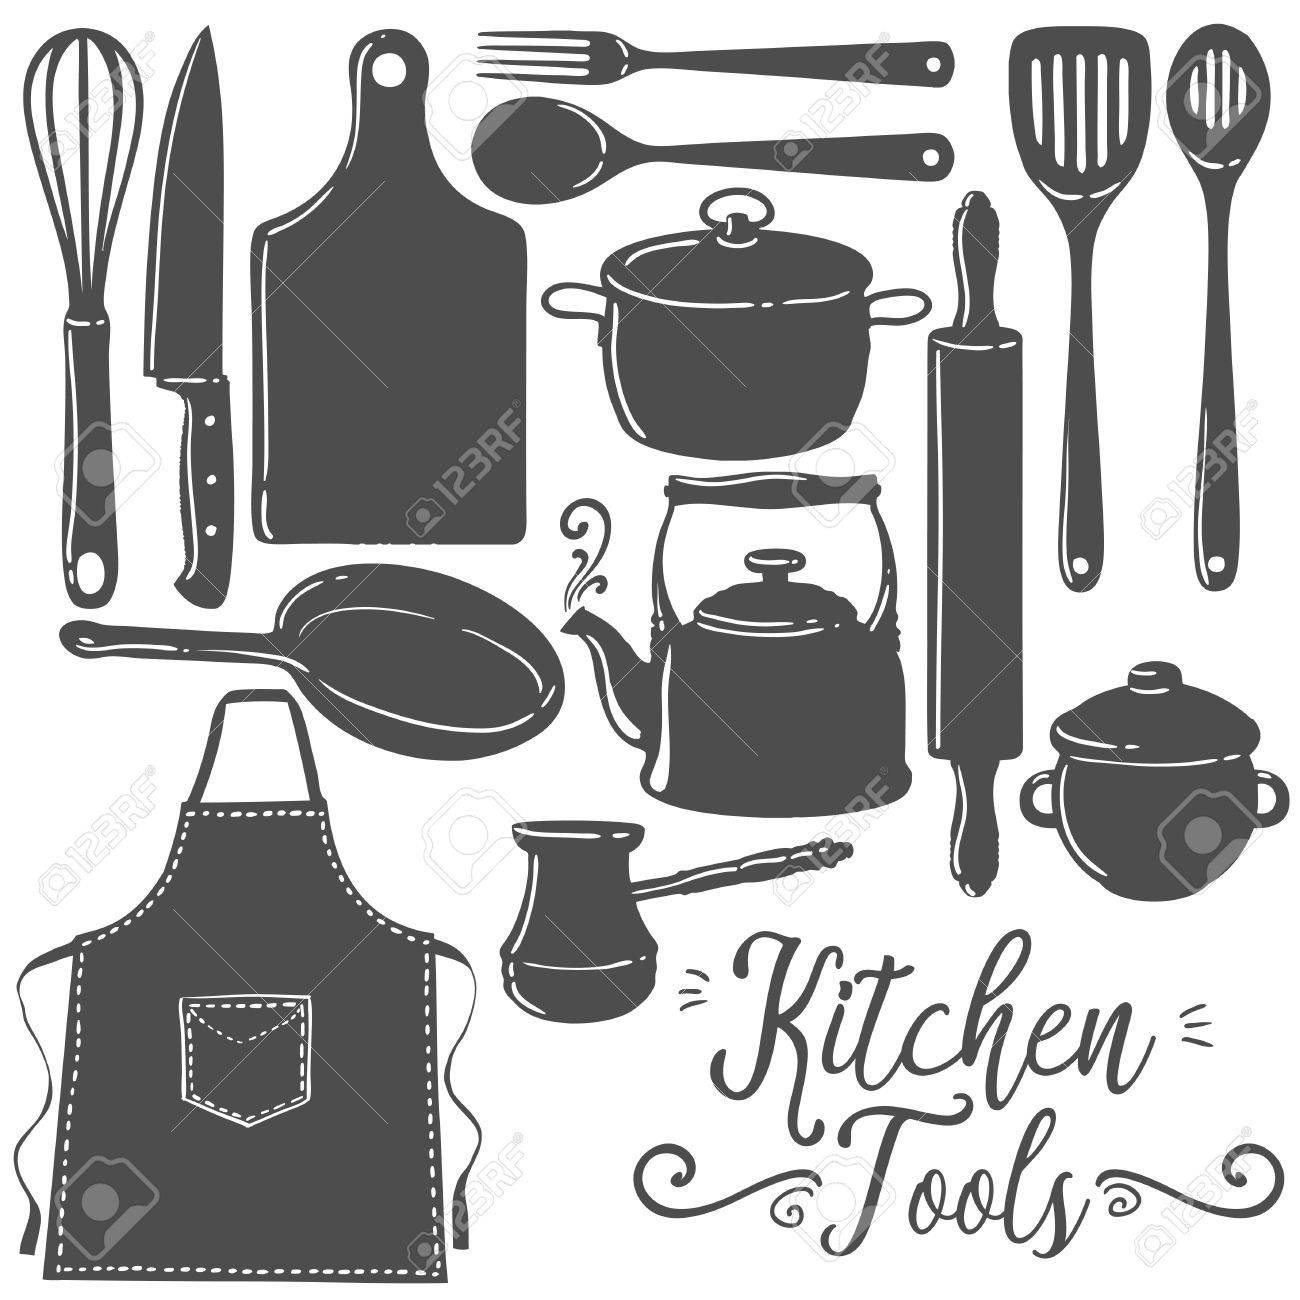 Küchengeräte, Backen, Gebäck Silhouette Flach Vektor-Set. Icon ...